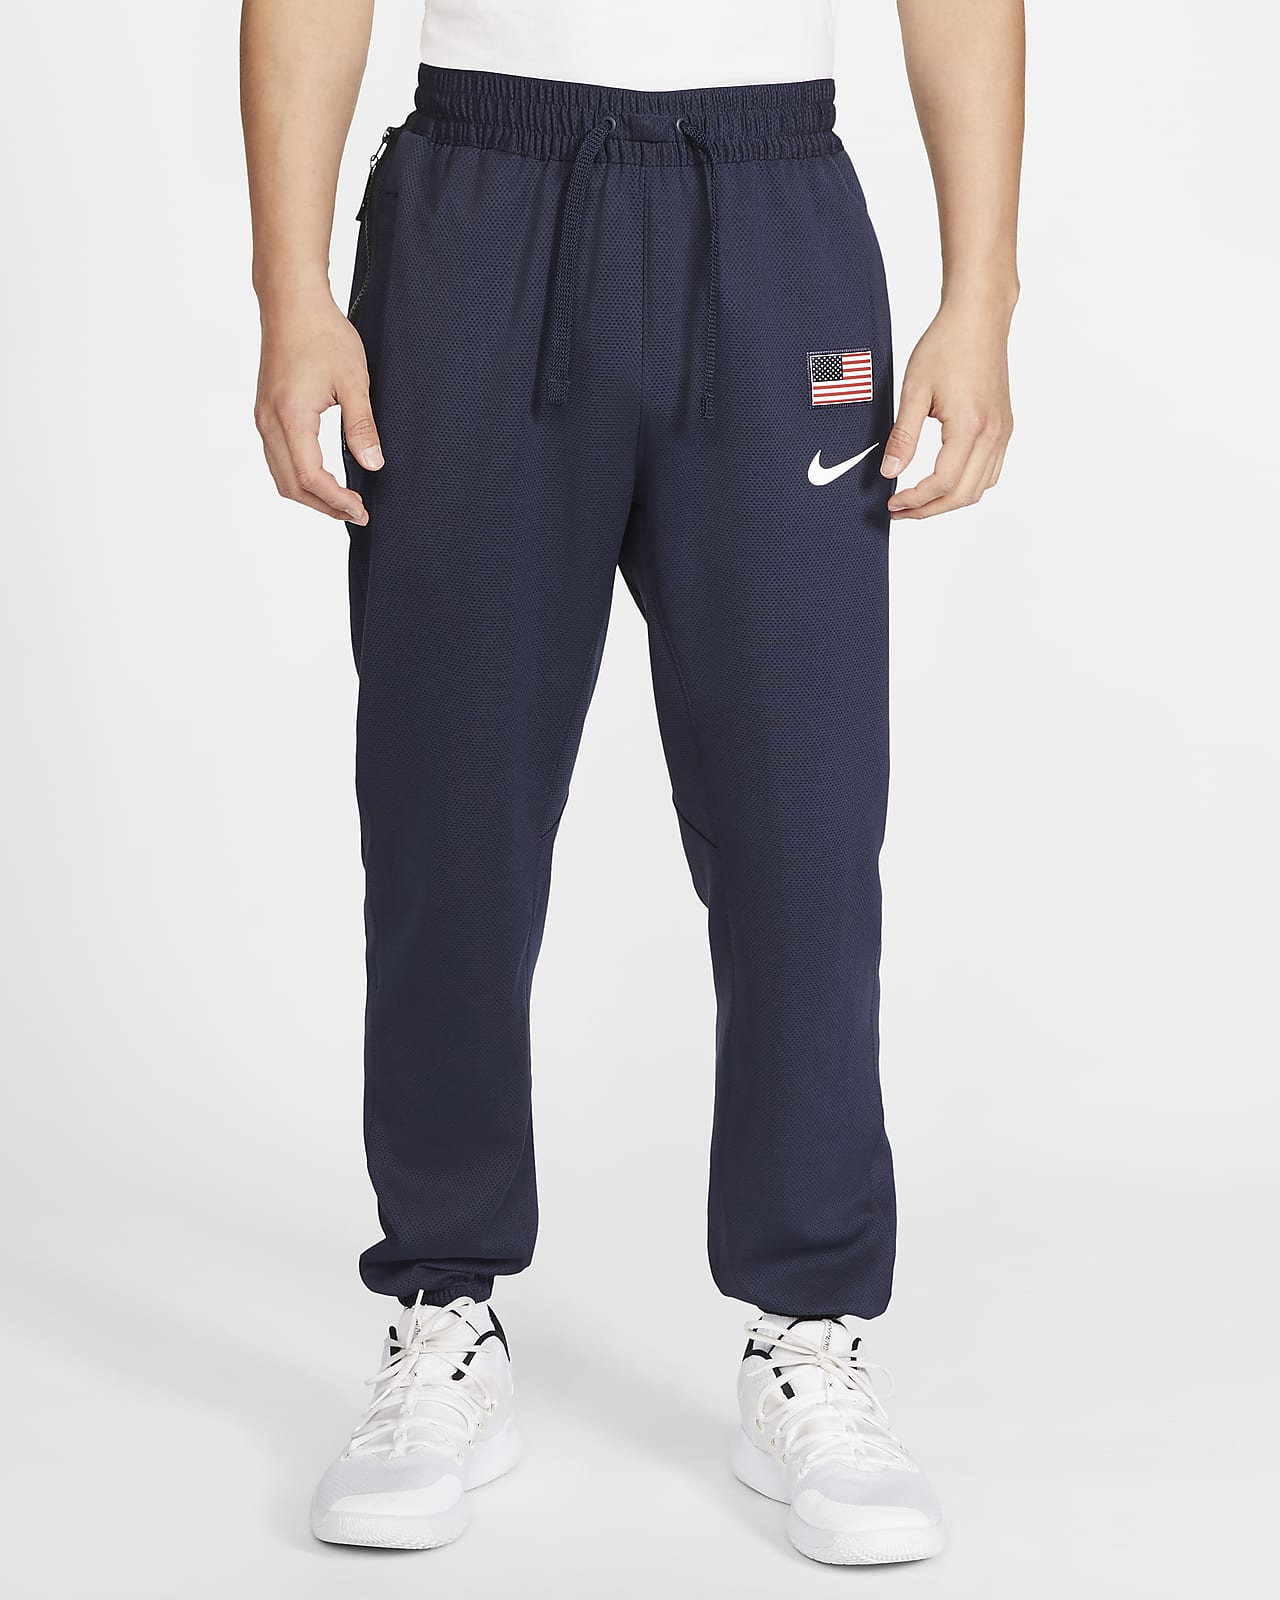 USA Nike Therma Flex Showtime Men's Basketball Pants